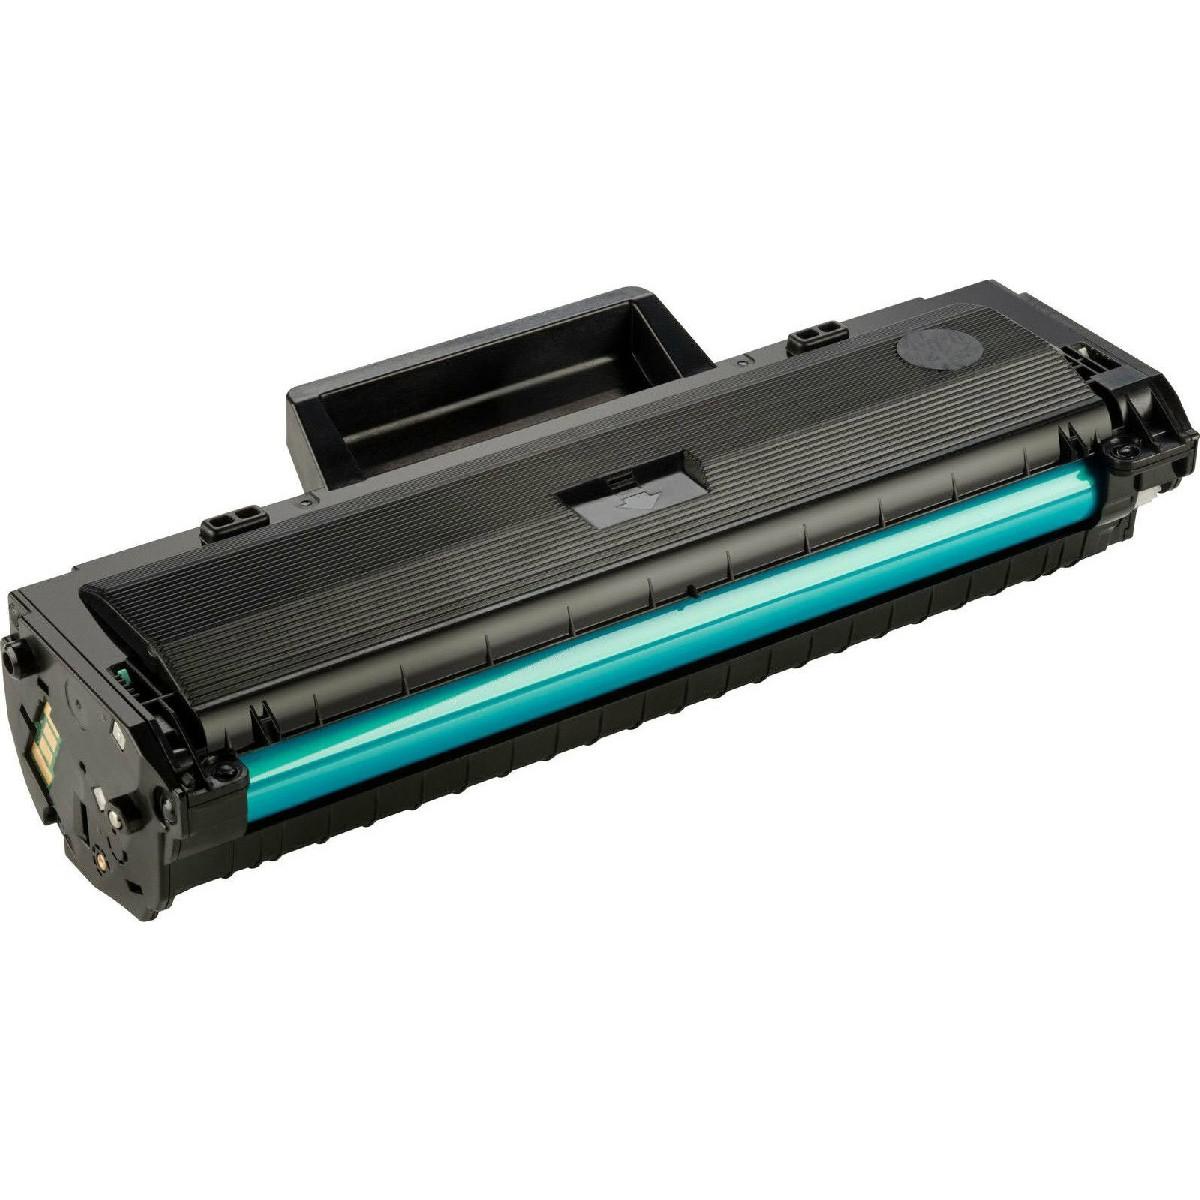 Toner HP Συμβατό W1106A XL 106A XL ΧΩΡΙΣ CHIP Σελίδες:5000 Black για Laserjet, LaserJet MFP,103A, 107A, 107R, 107W